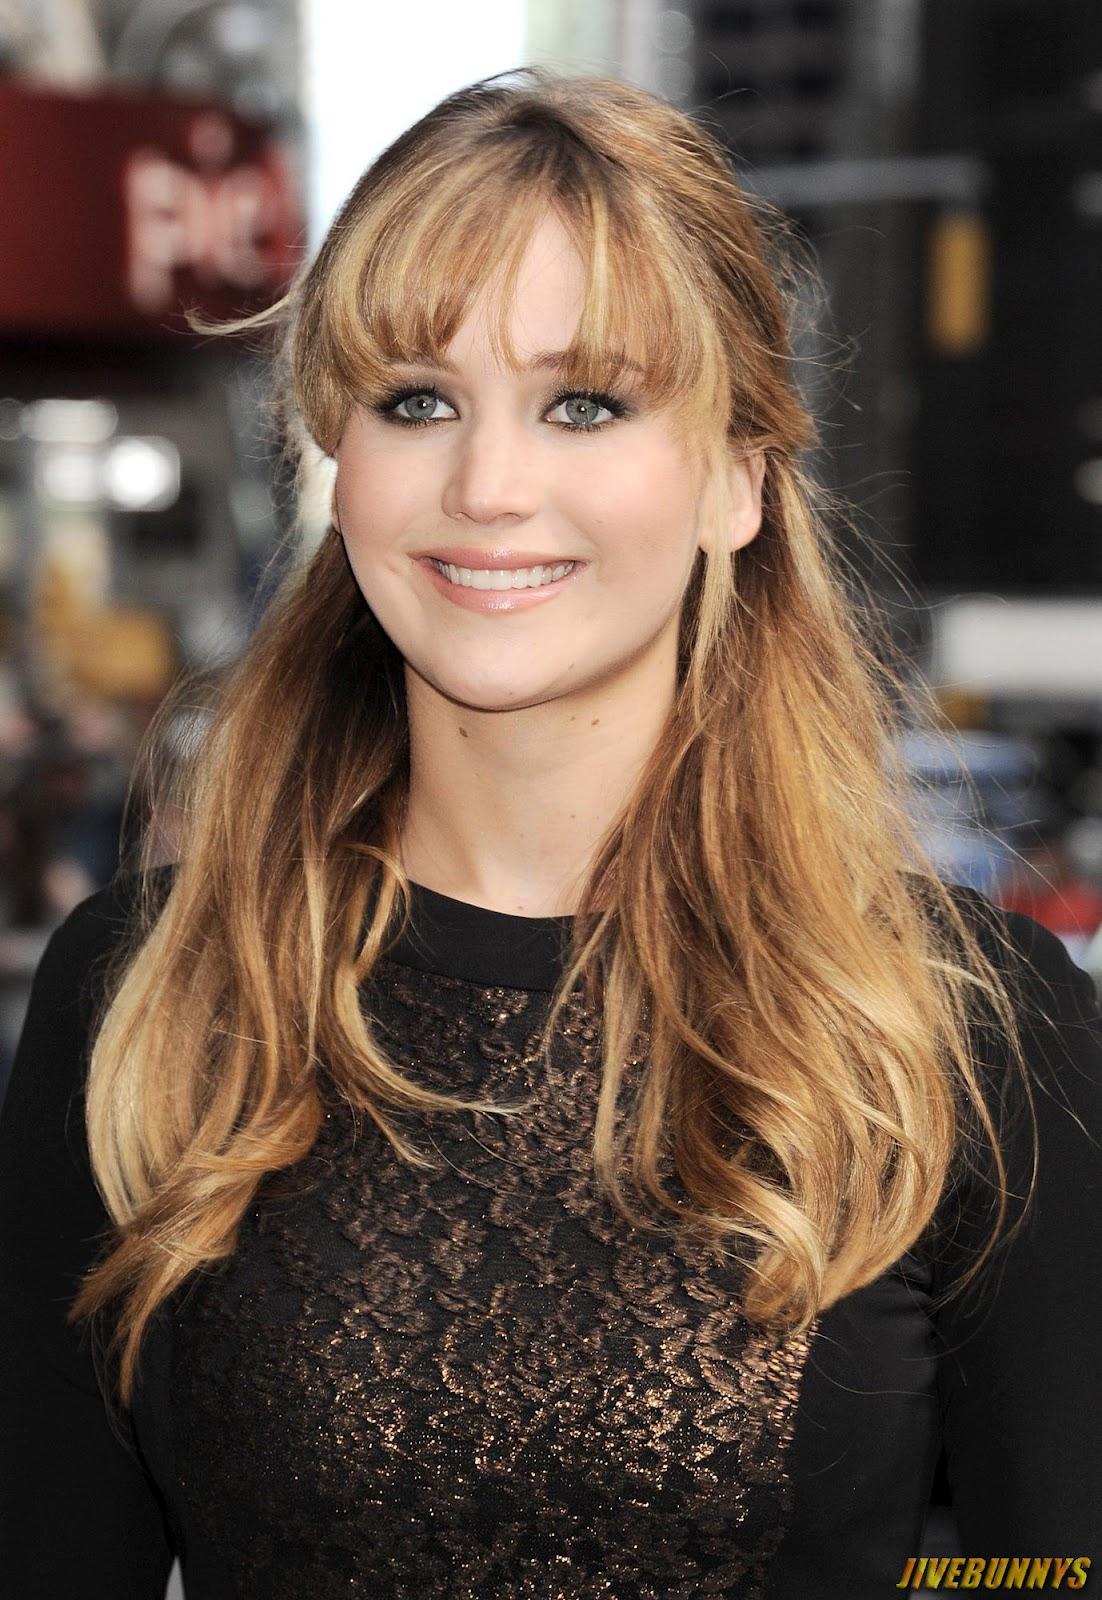 Jivebunnys Female Celebrity Picture Gallery: Jennifer ... Jennifer Lawrence Movies